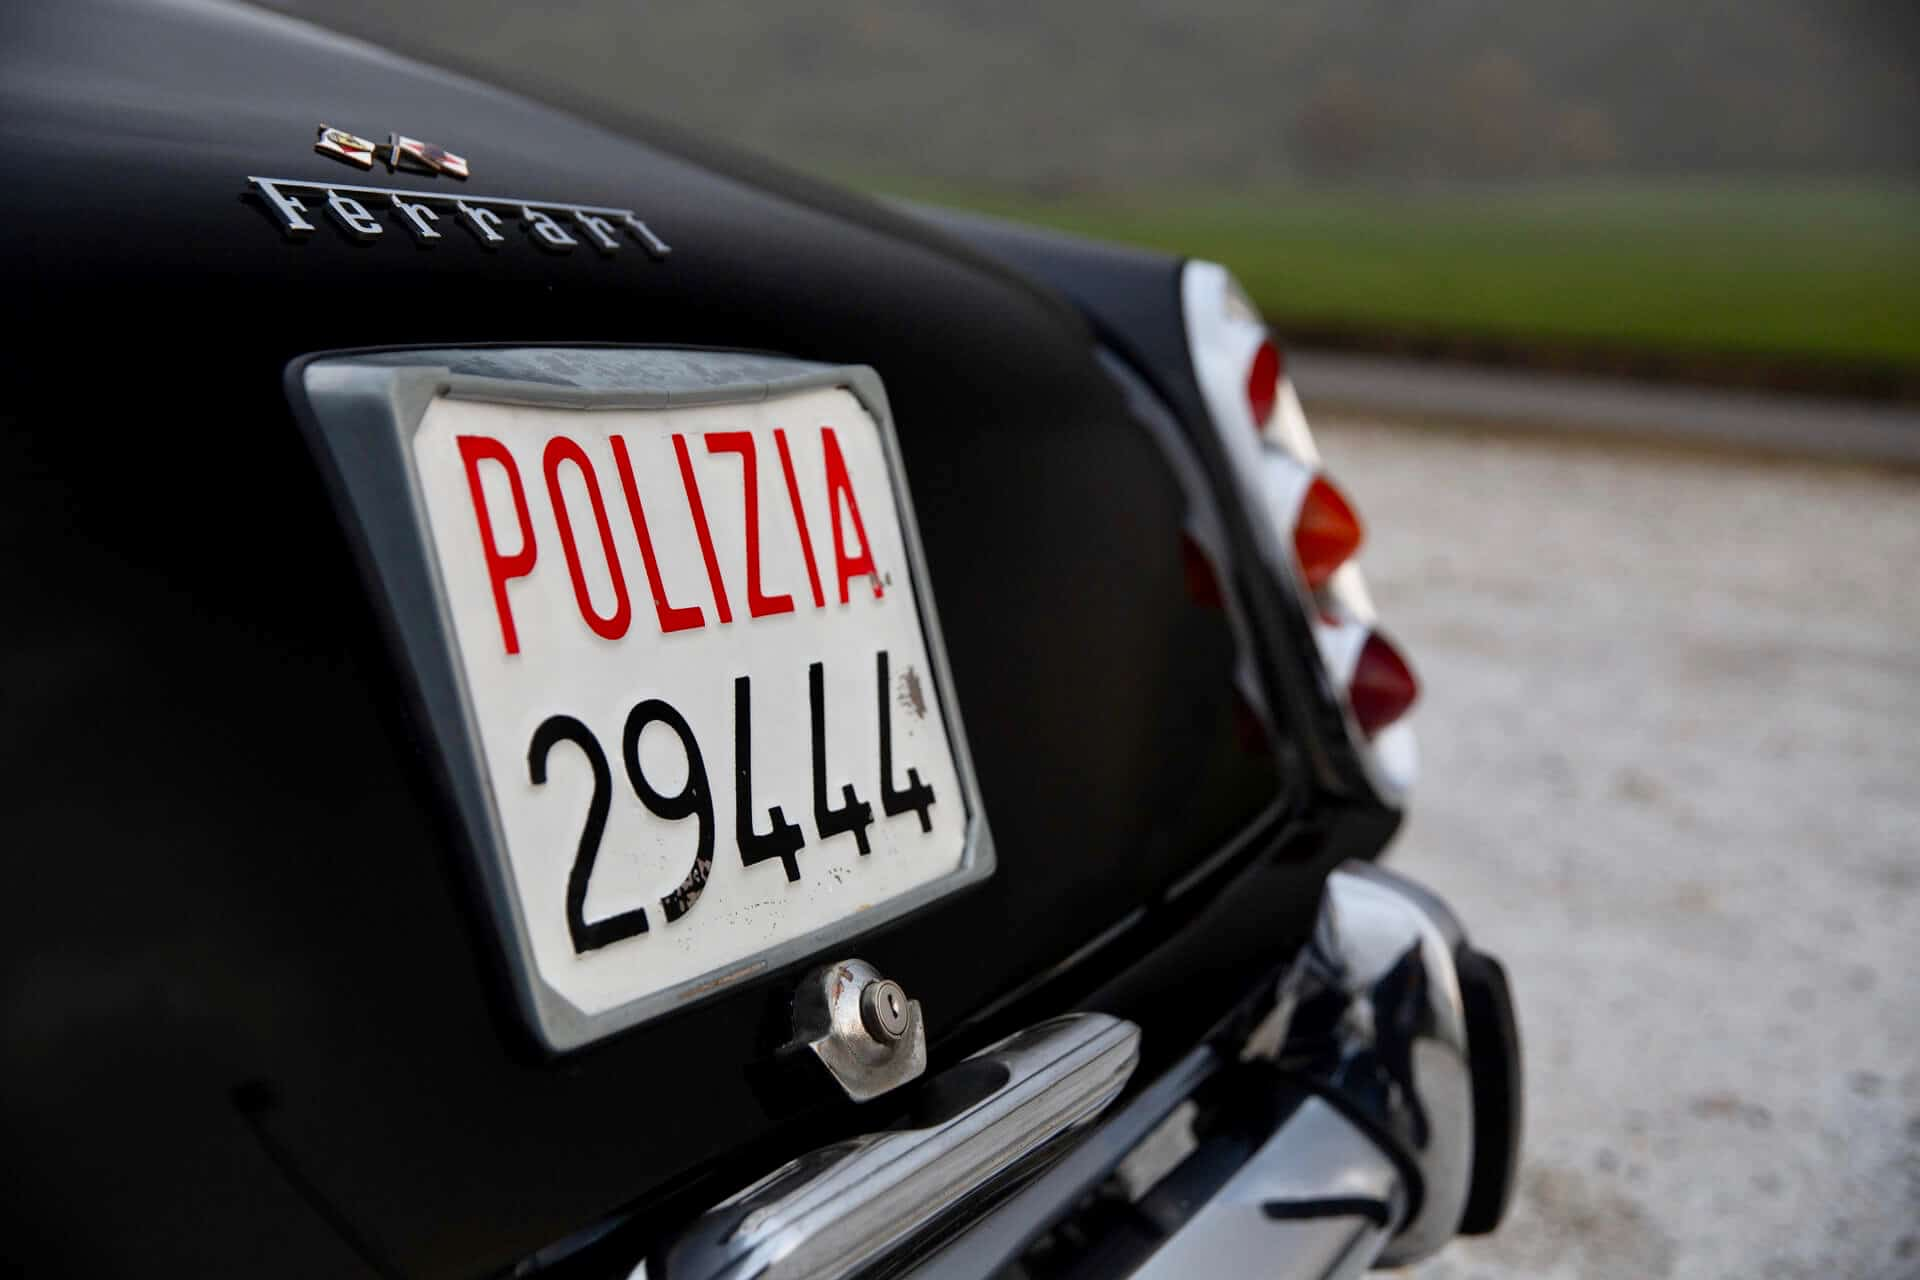 Ferrari 'Polizia' car, 1962 Ferrari 250 'Polizia' car is for sale, ClassicCars.com Journal